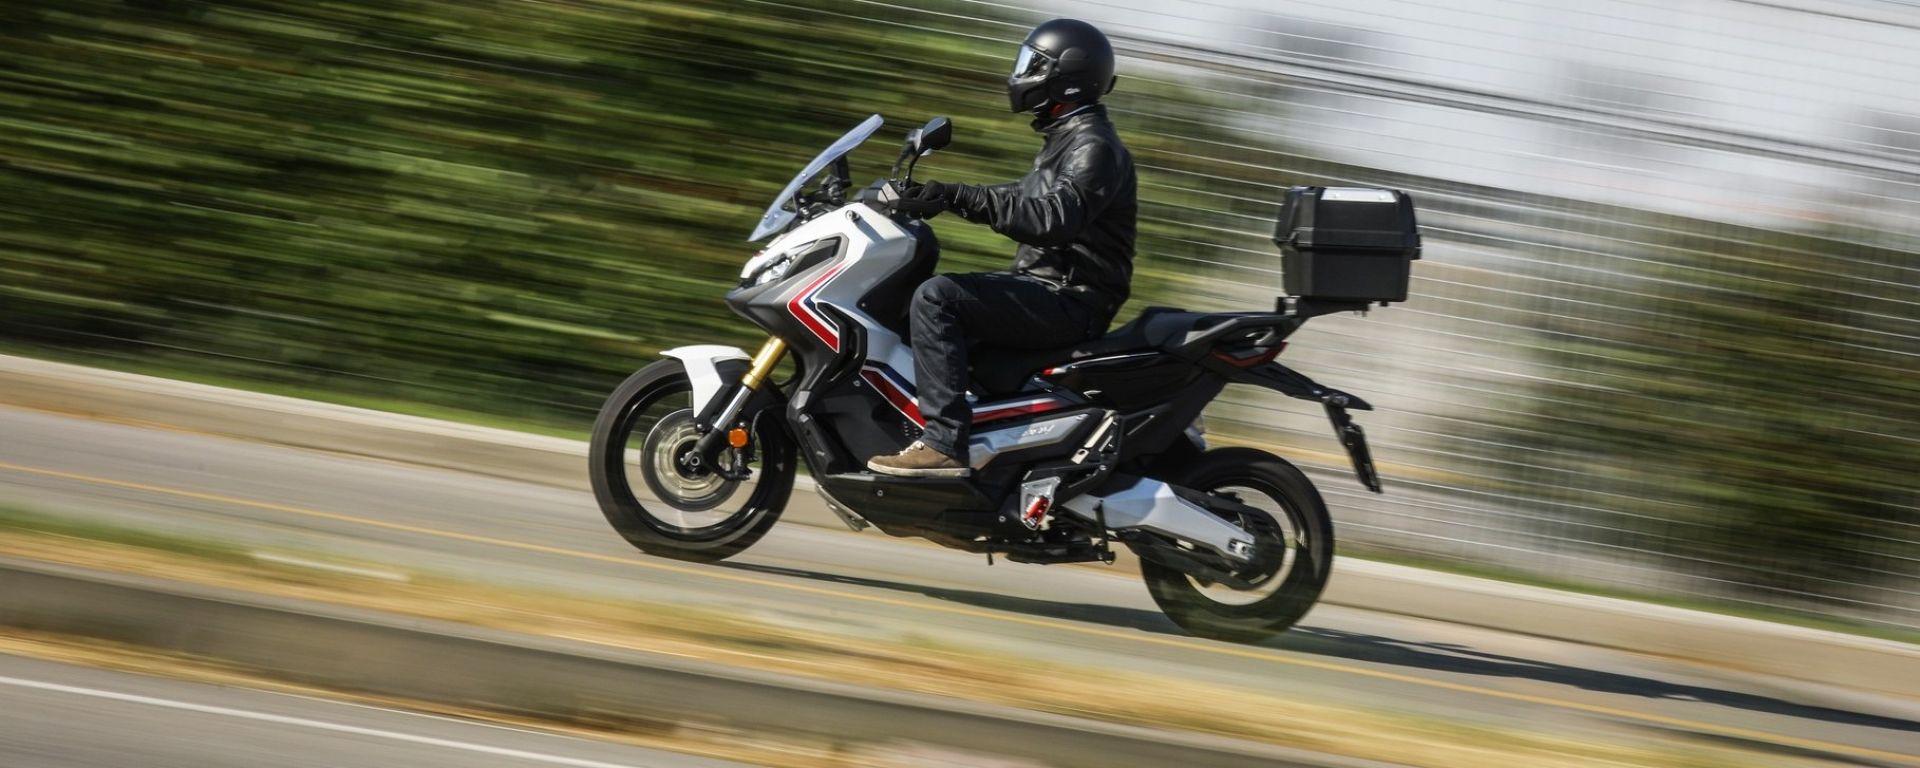 Honda X-ADV ha una progressione entusiasmante